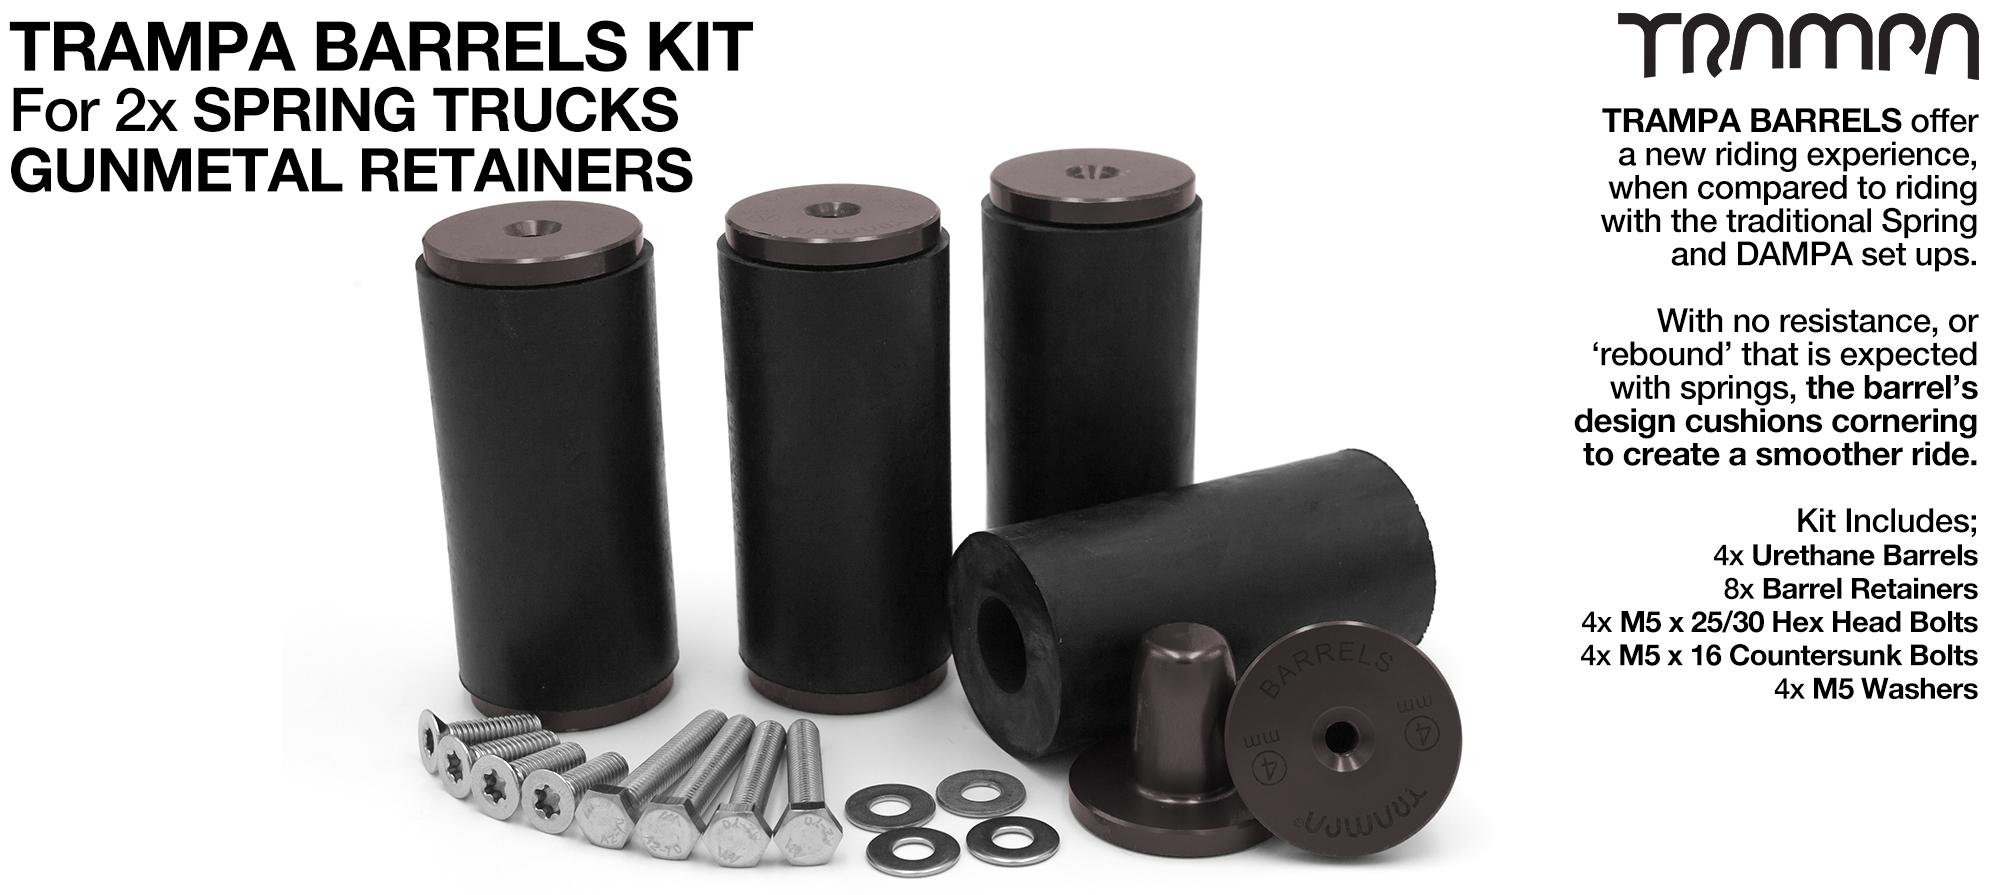 TRAMPA BARRELS Complete DECK Kit - GUNMETAL